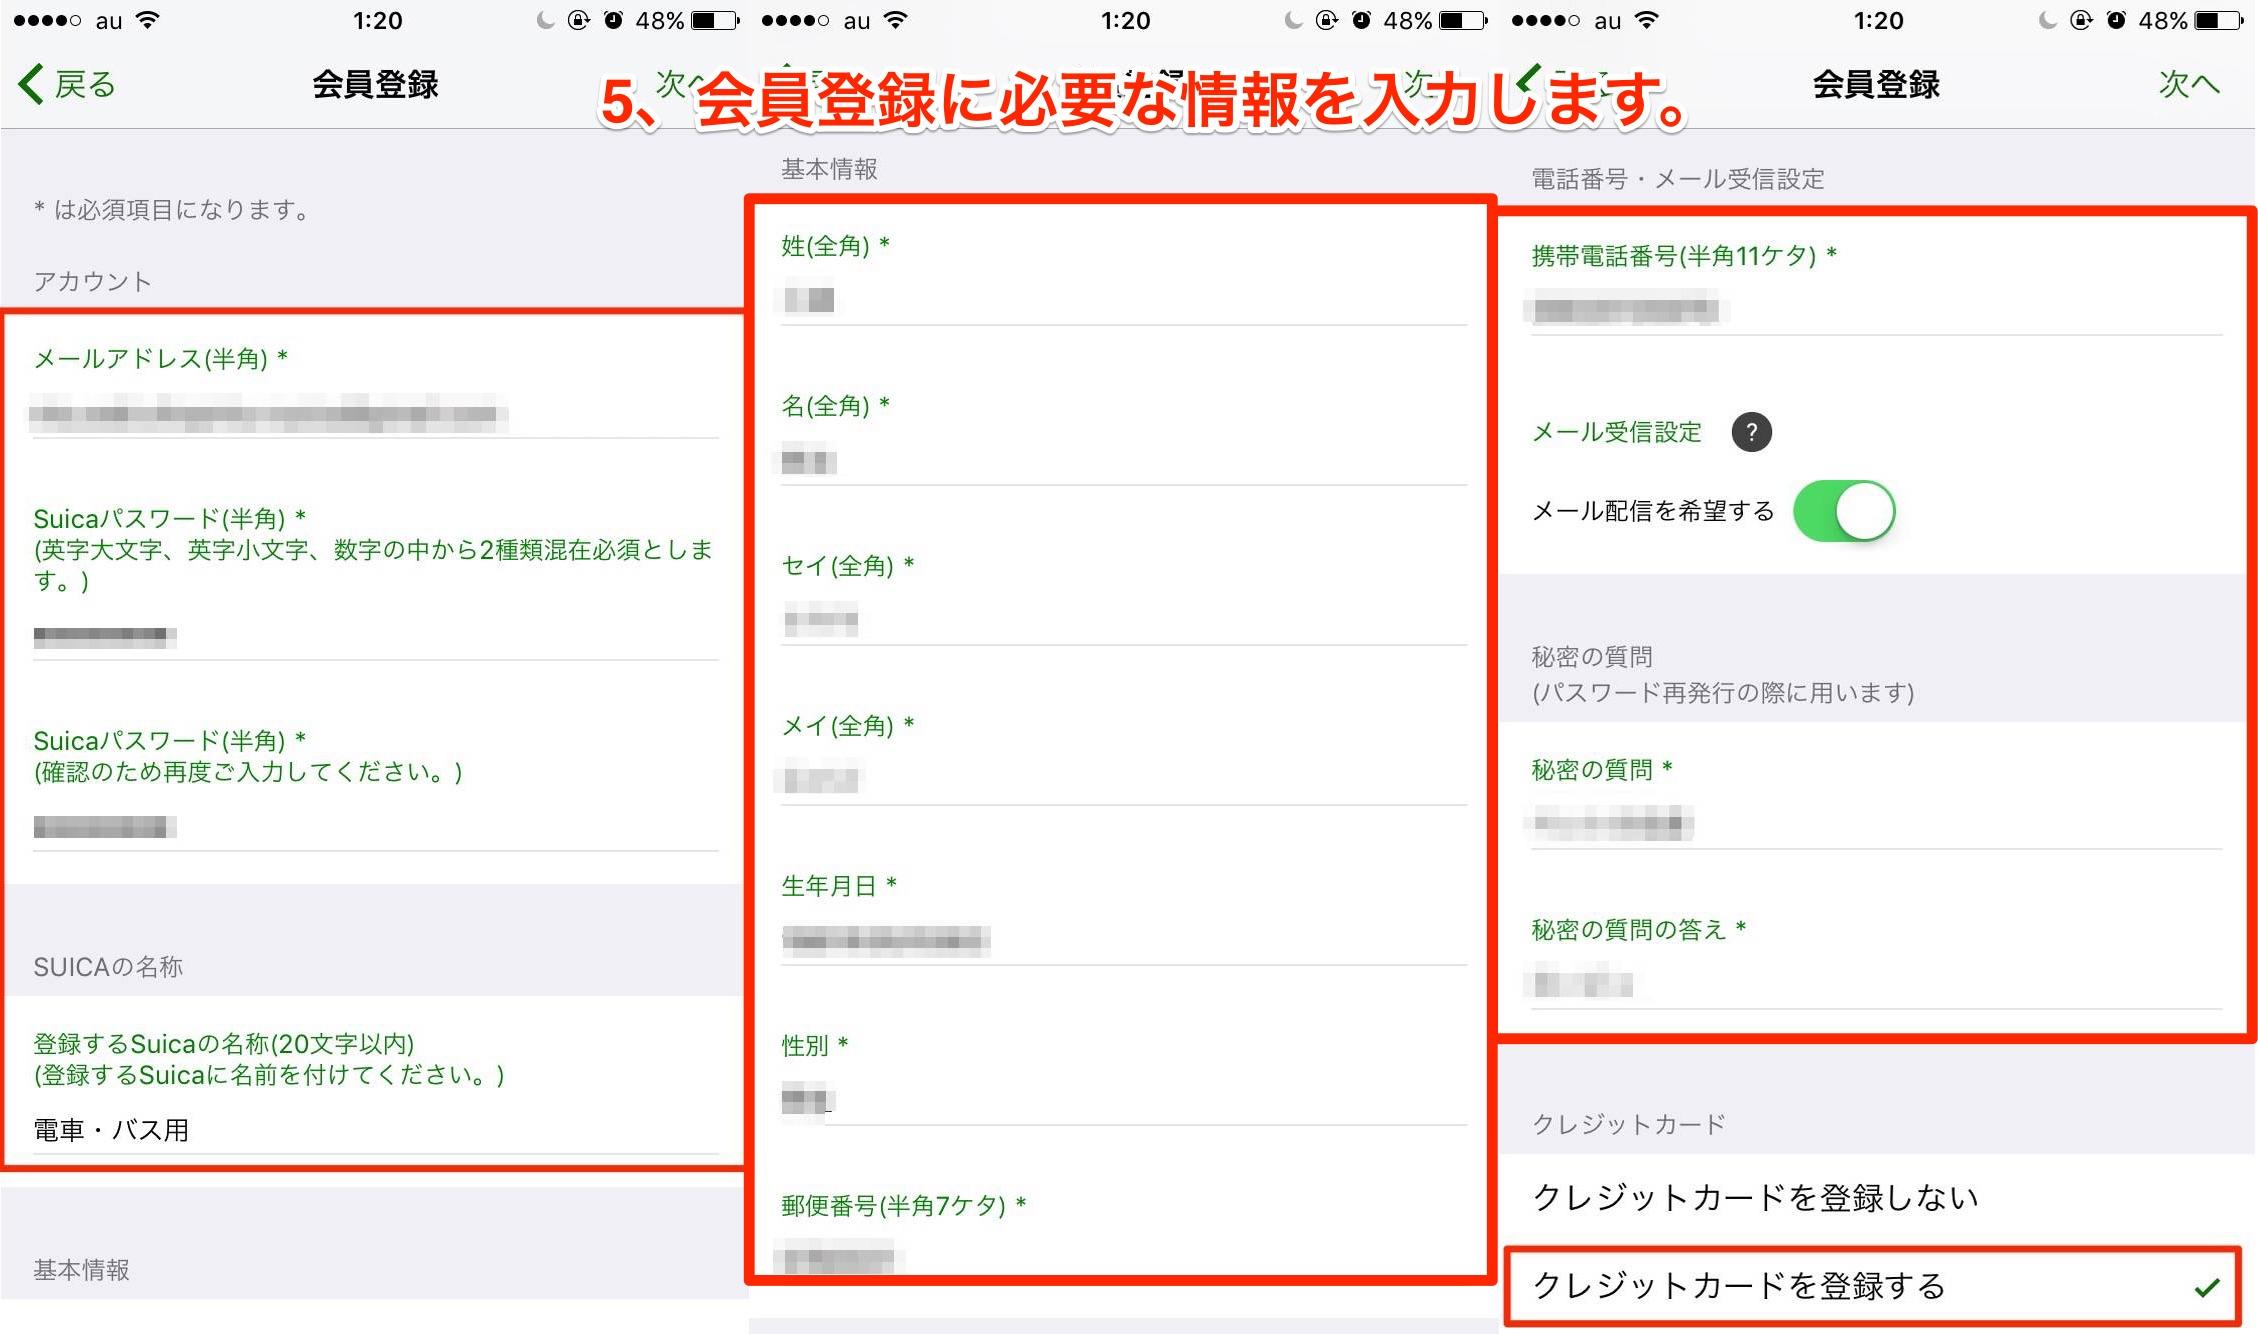 Apple Pay Suica4 - Suicaカードを持ってない人がApple PayにSuicaを新規登録する方法